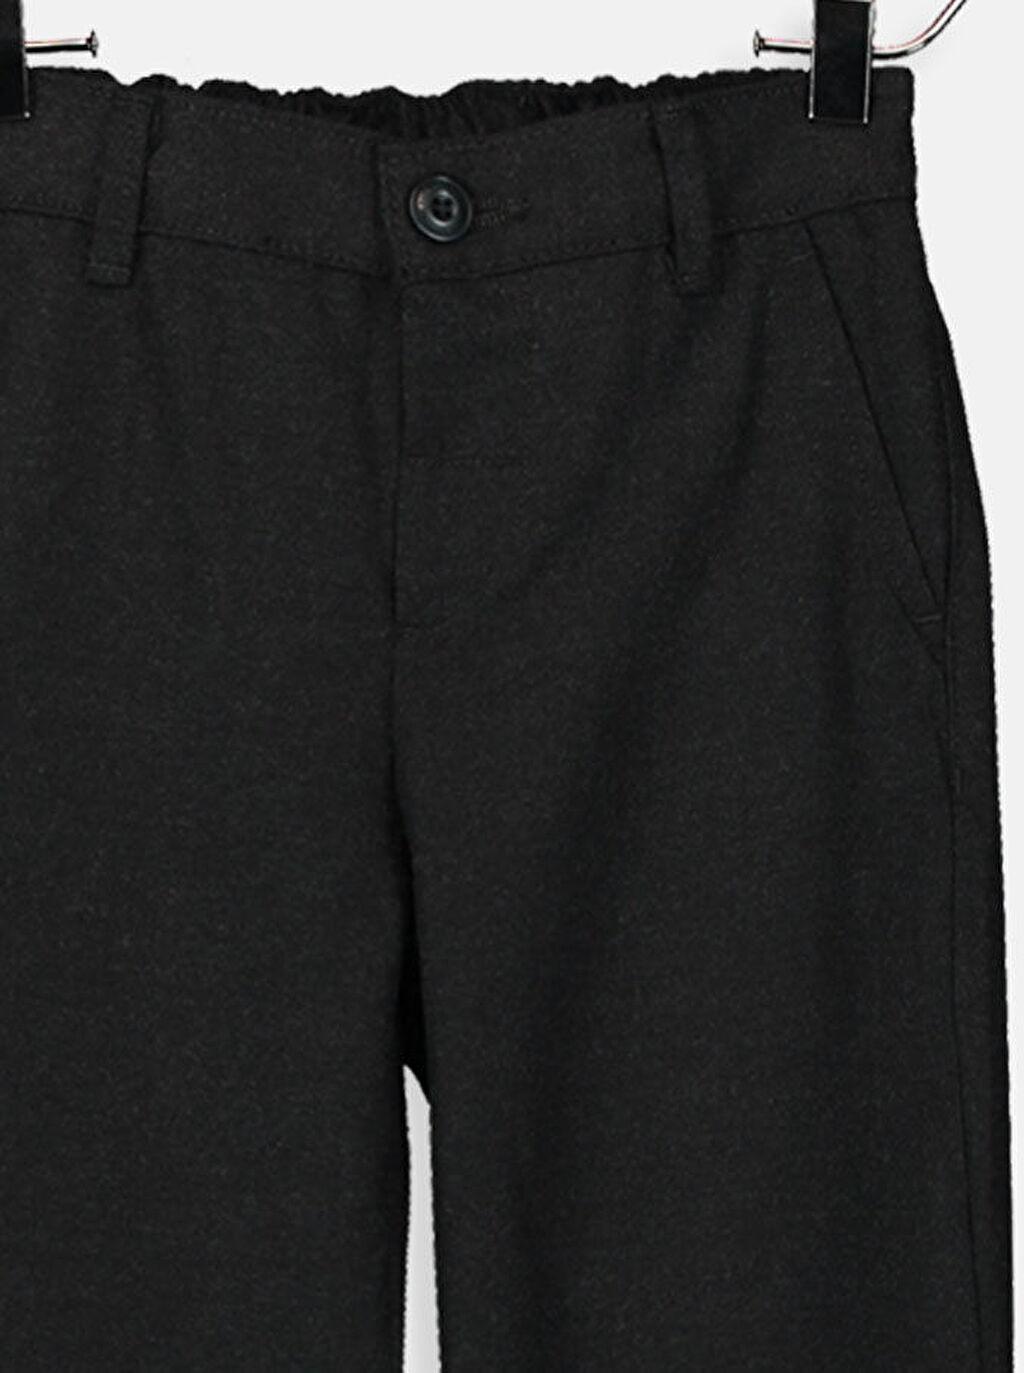 Erkek Çocuk Erkek Çocuk Chino Pantolon